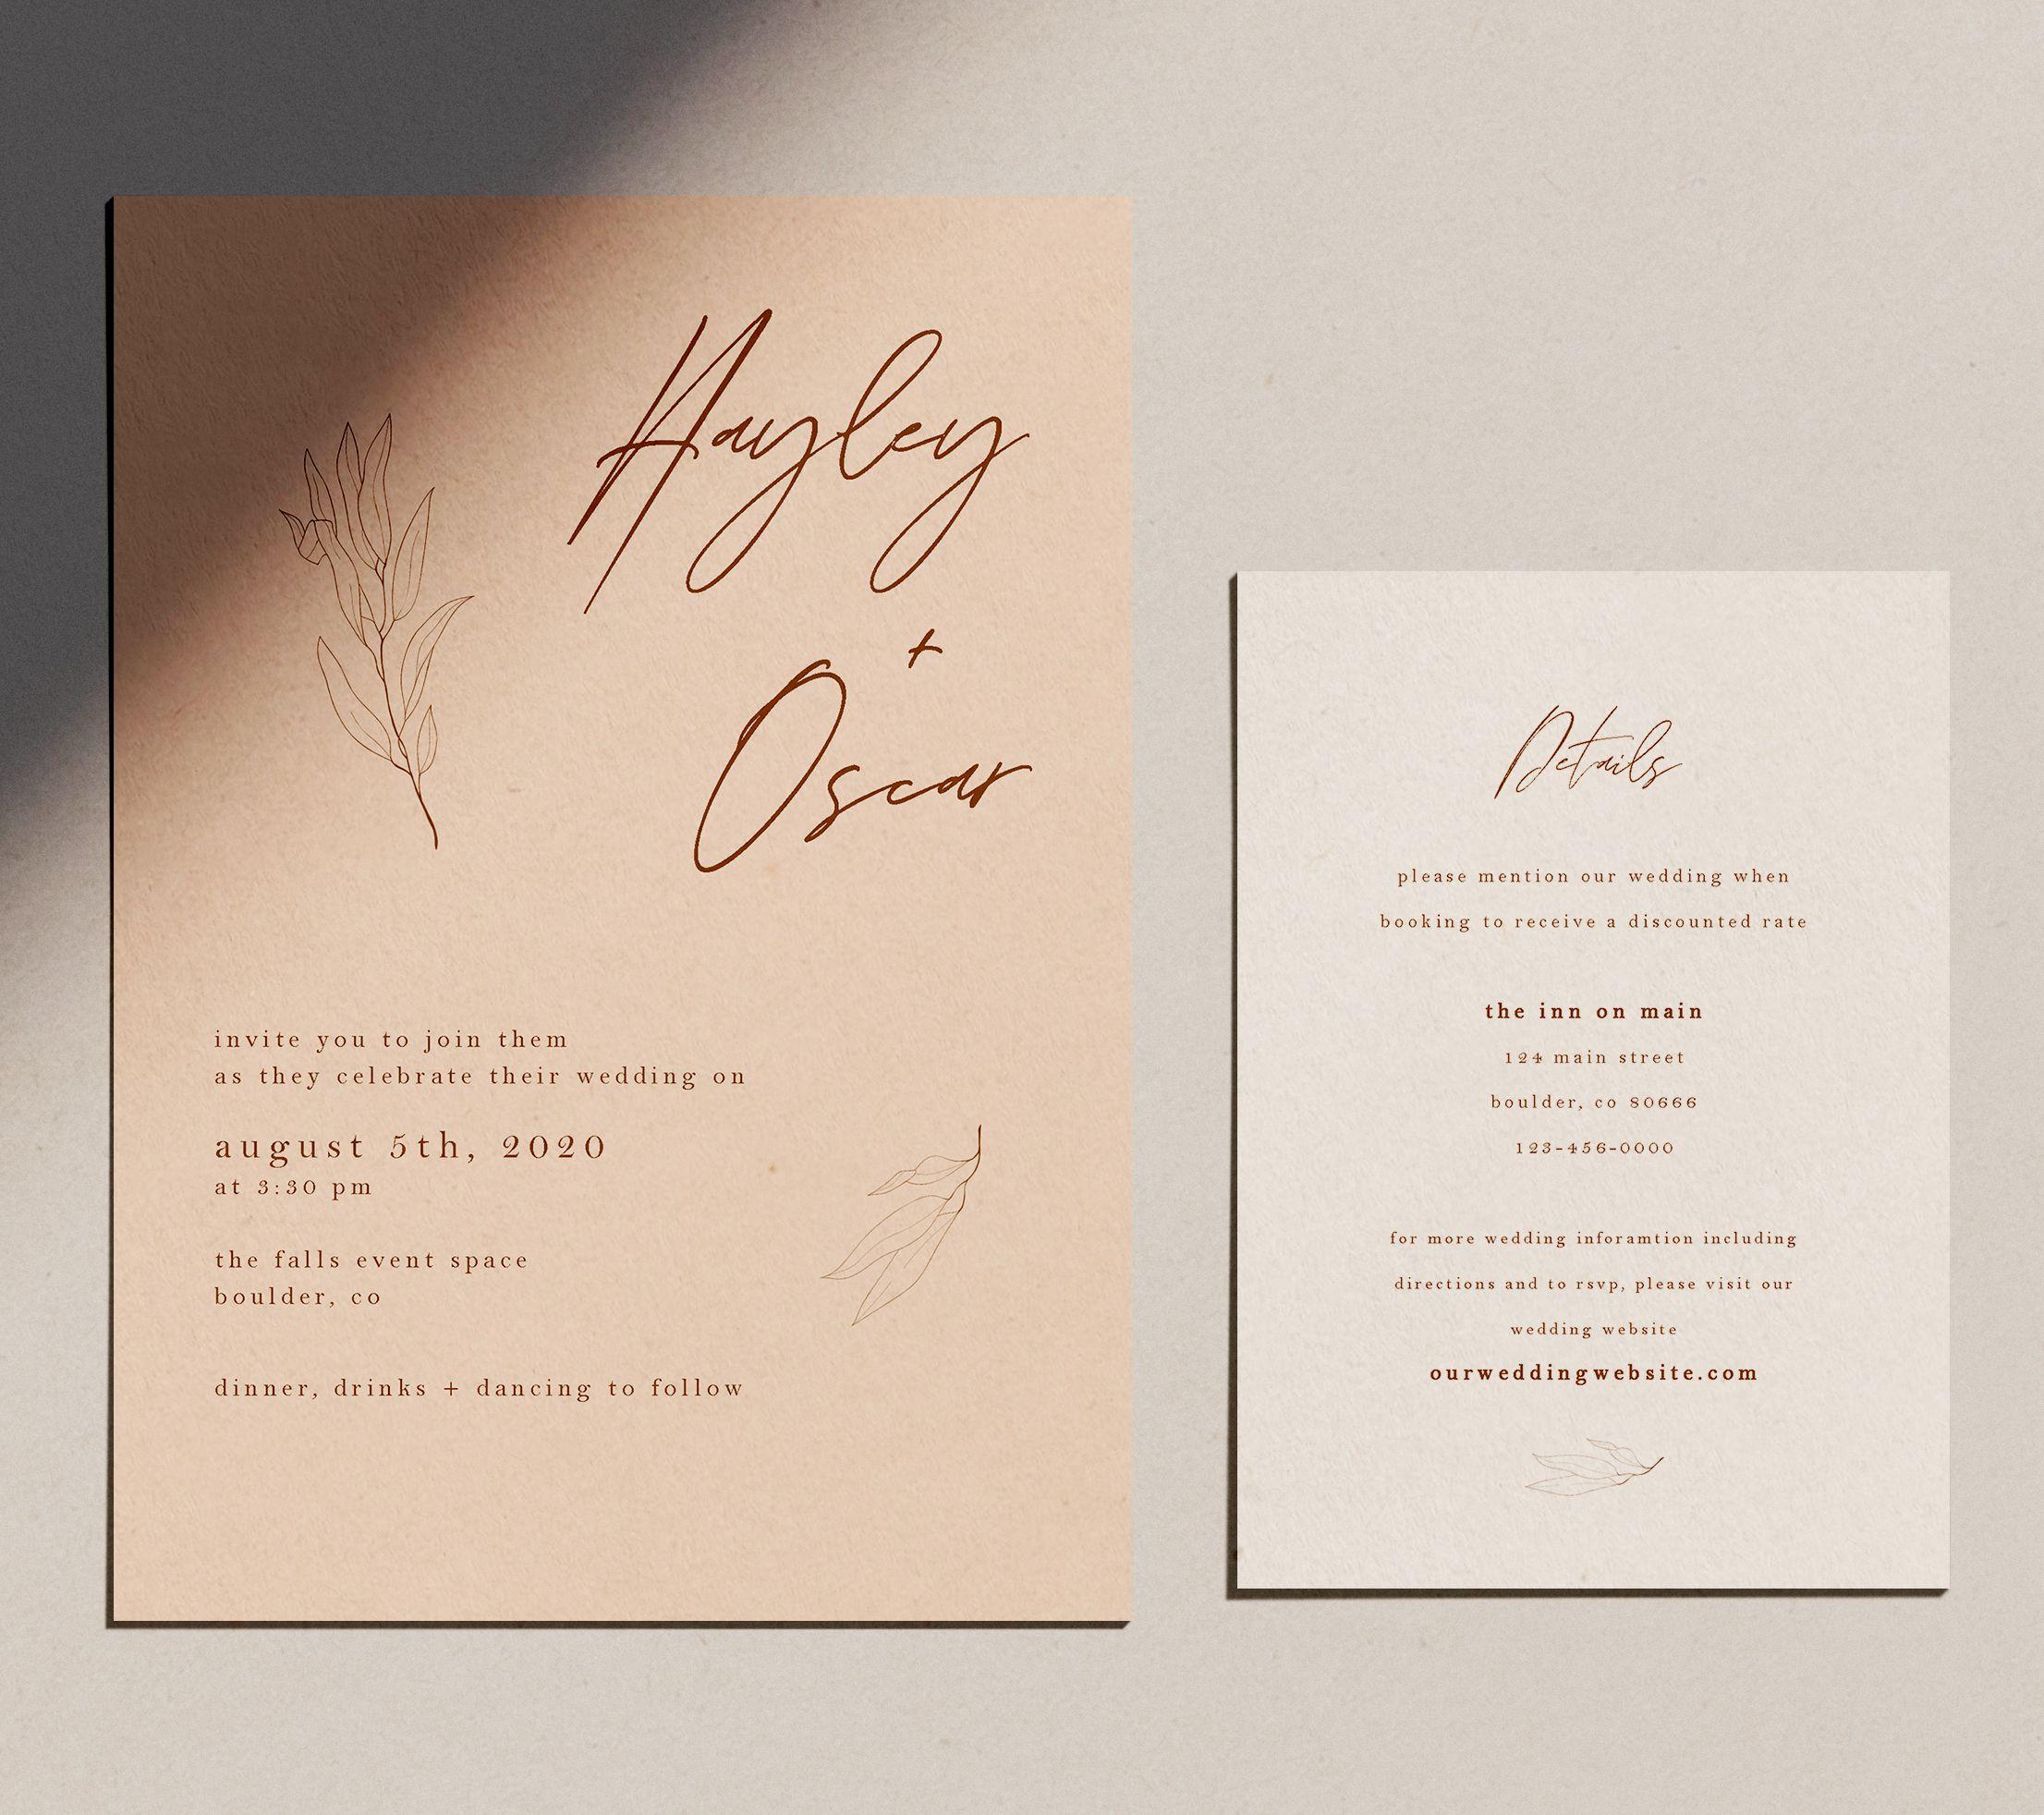 Modern Contemporary Wedding Invitation And Details Card Contemporary Wedding Invitations Modern Wedding Invitations Boho Invitations